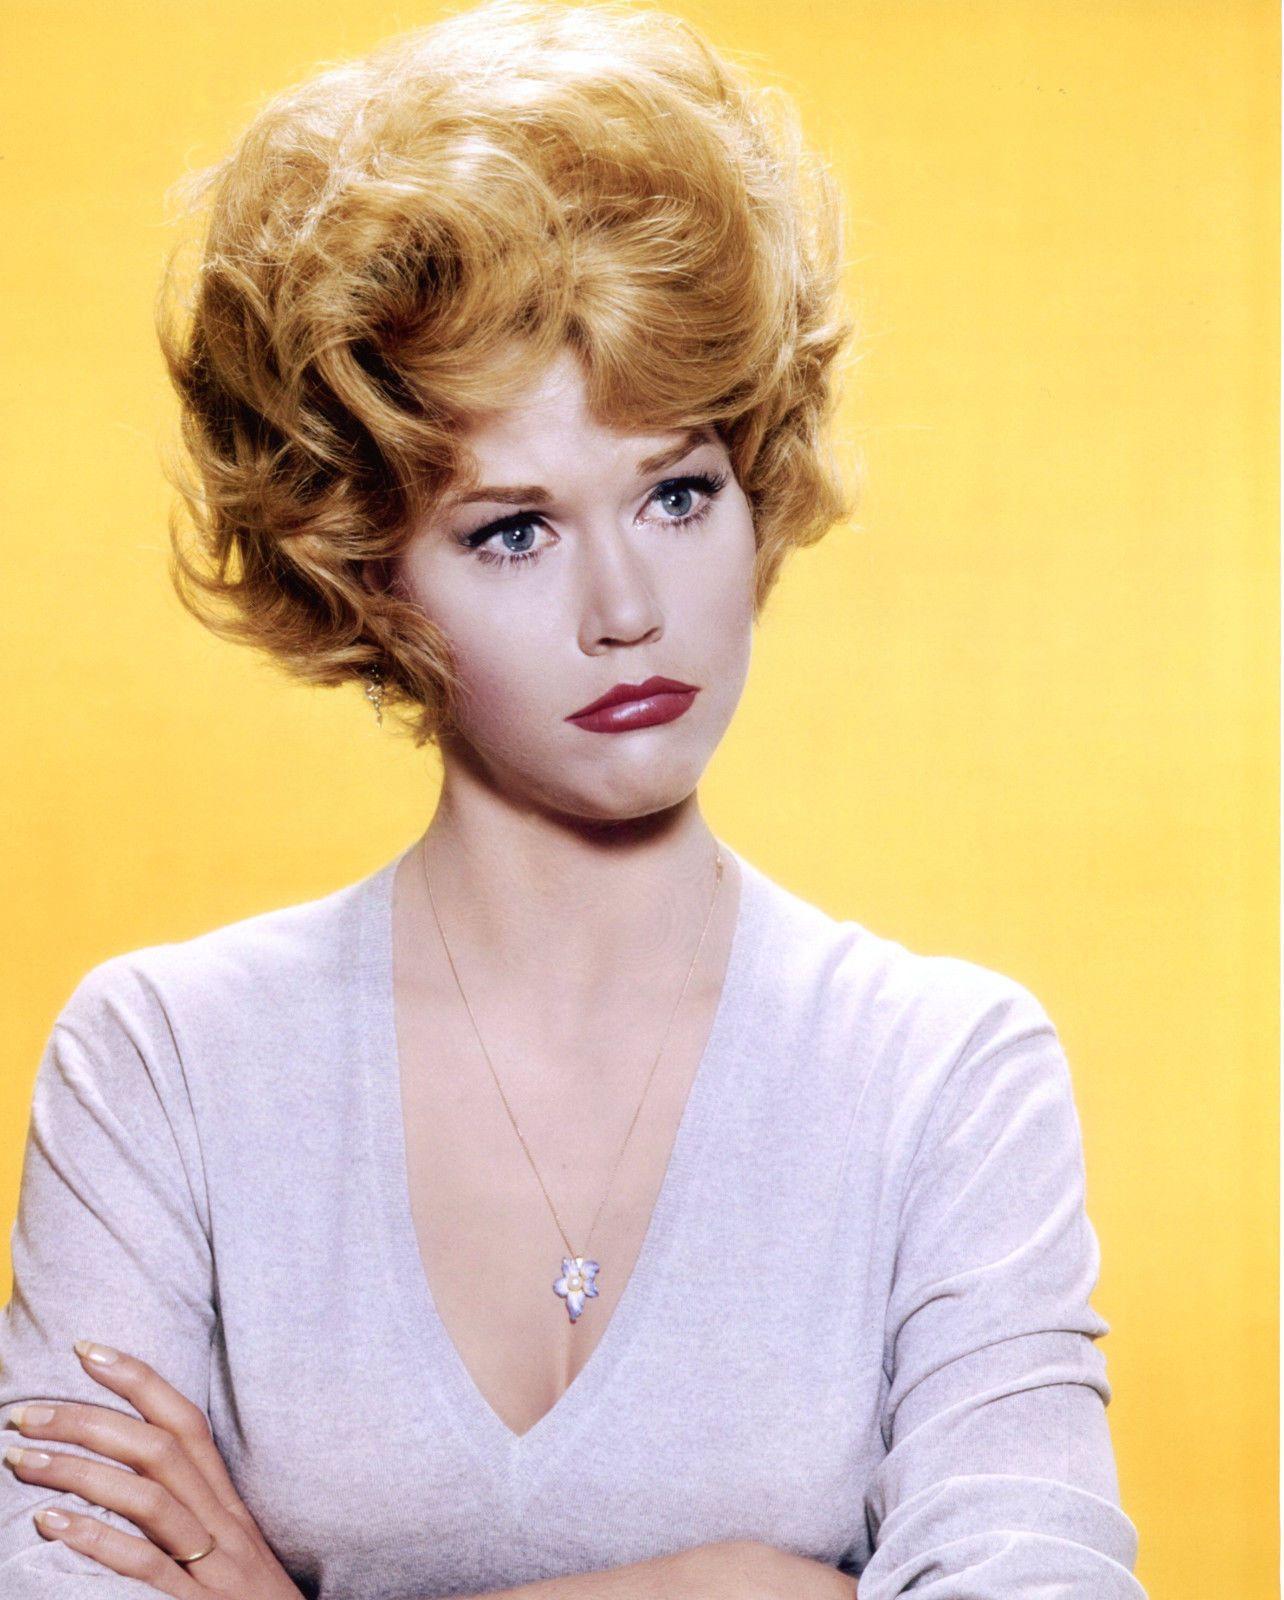 Jane Fonda 8x10 T0992 eBay